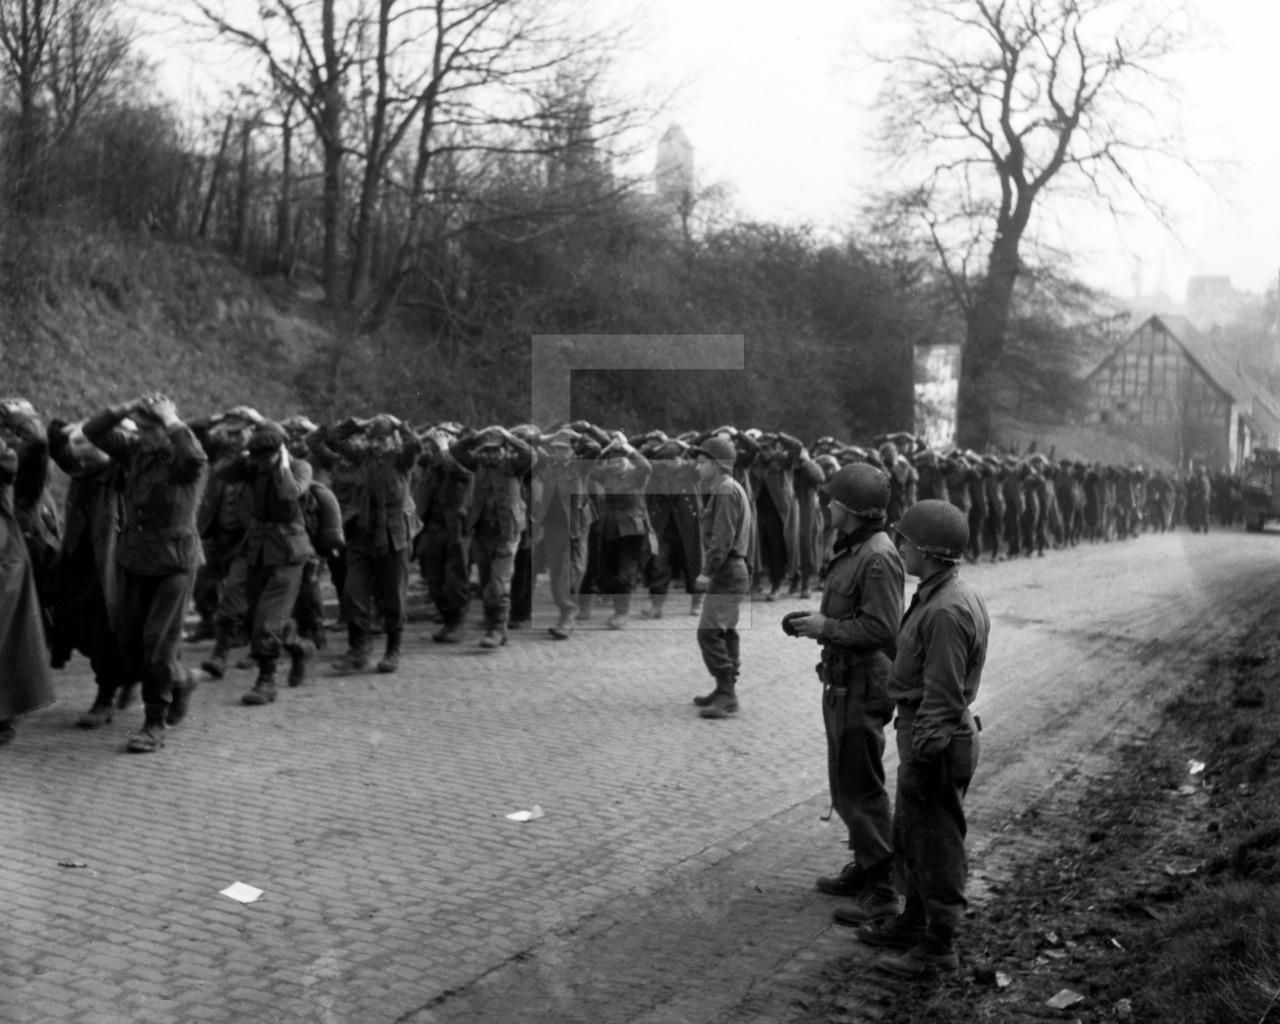 45 WW2 Limburg an der Lahn Hessen Germany POW 2nd Infantry